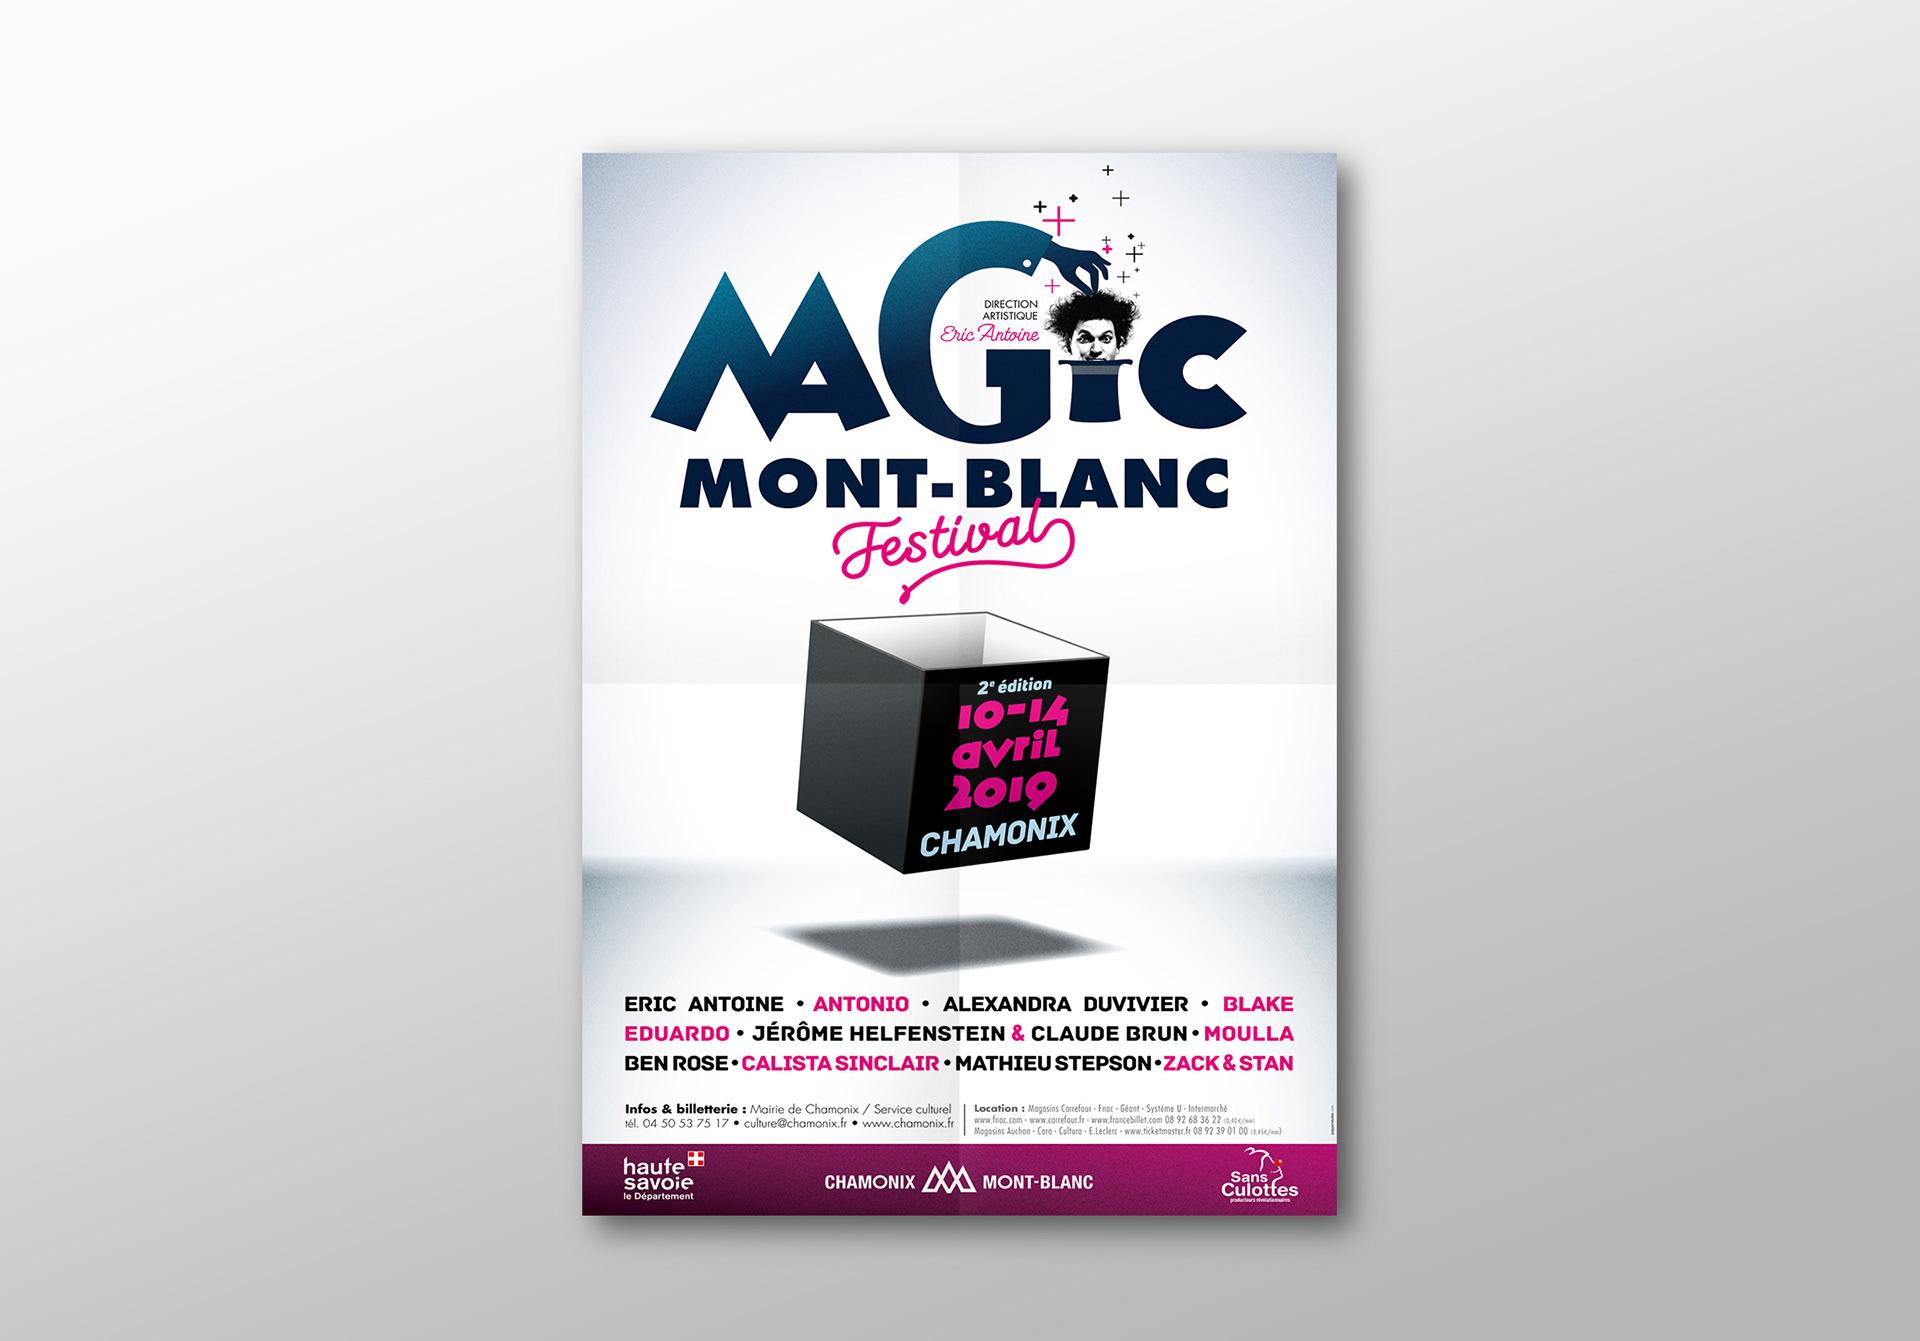 Chamonix Magic Mont Blanc Festival Visual Identity On Behance